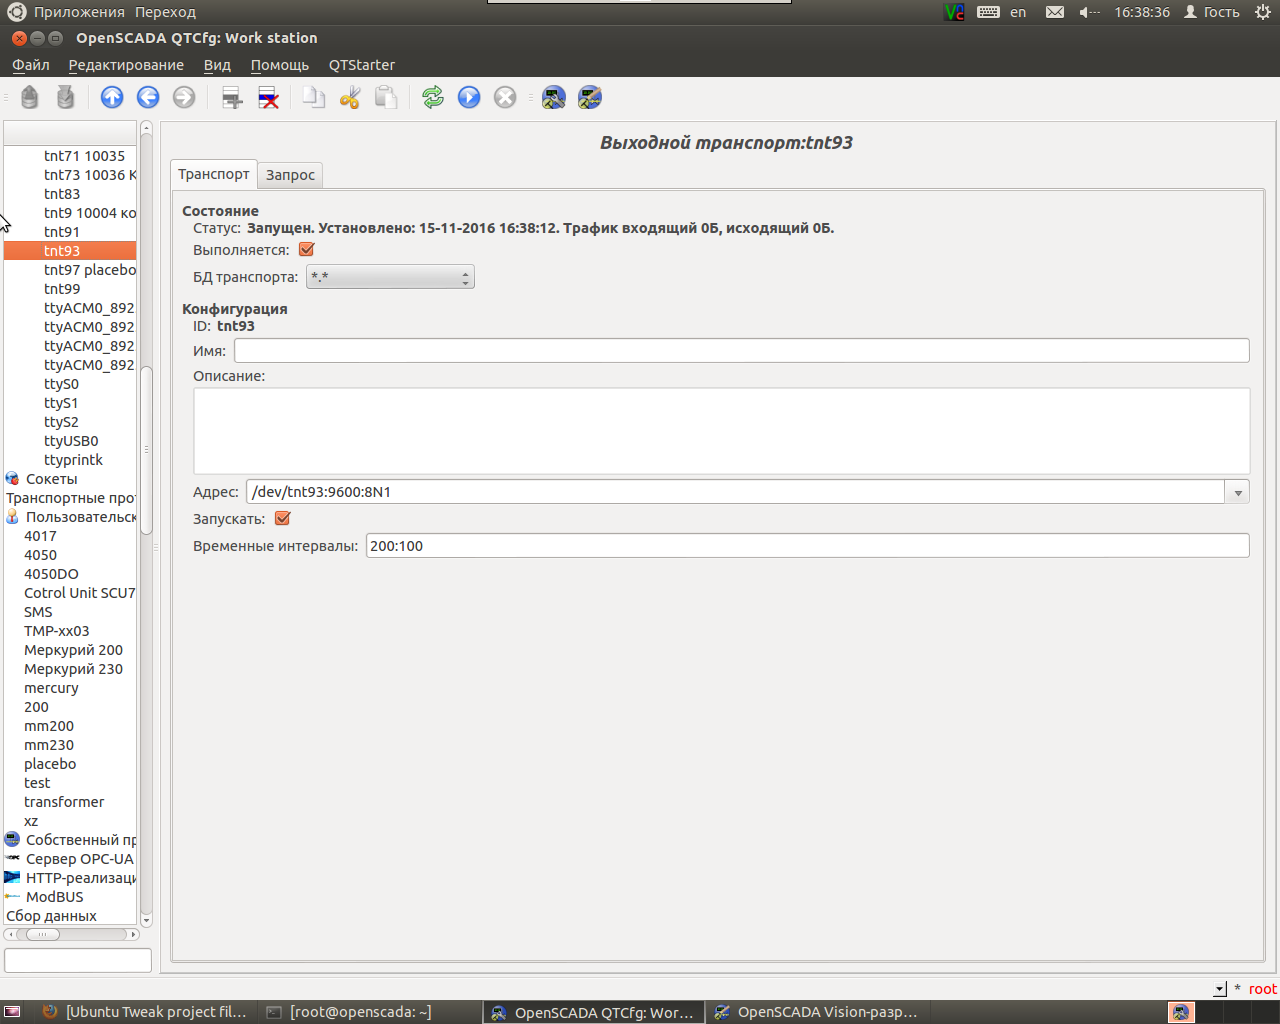 Пишем протоколы счетчиков Меркурий 230 и Меркурий 200 для OpenSCADA - 8